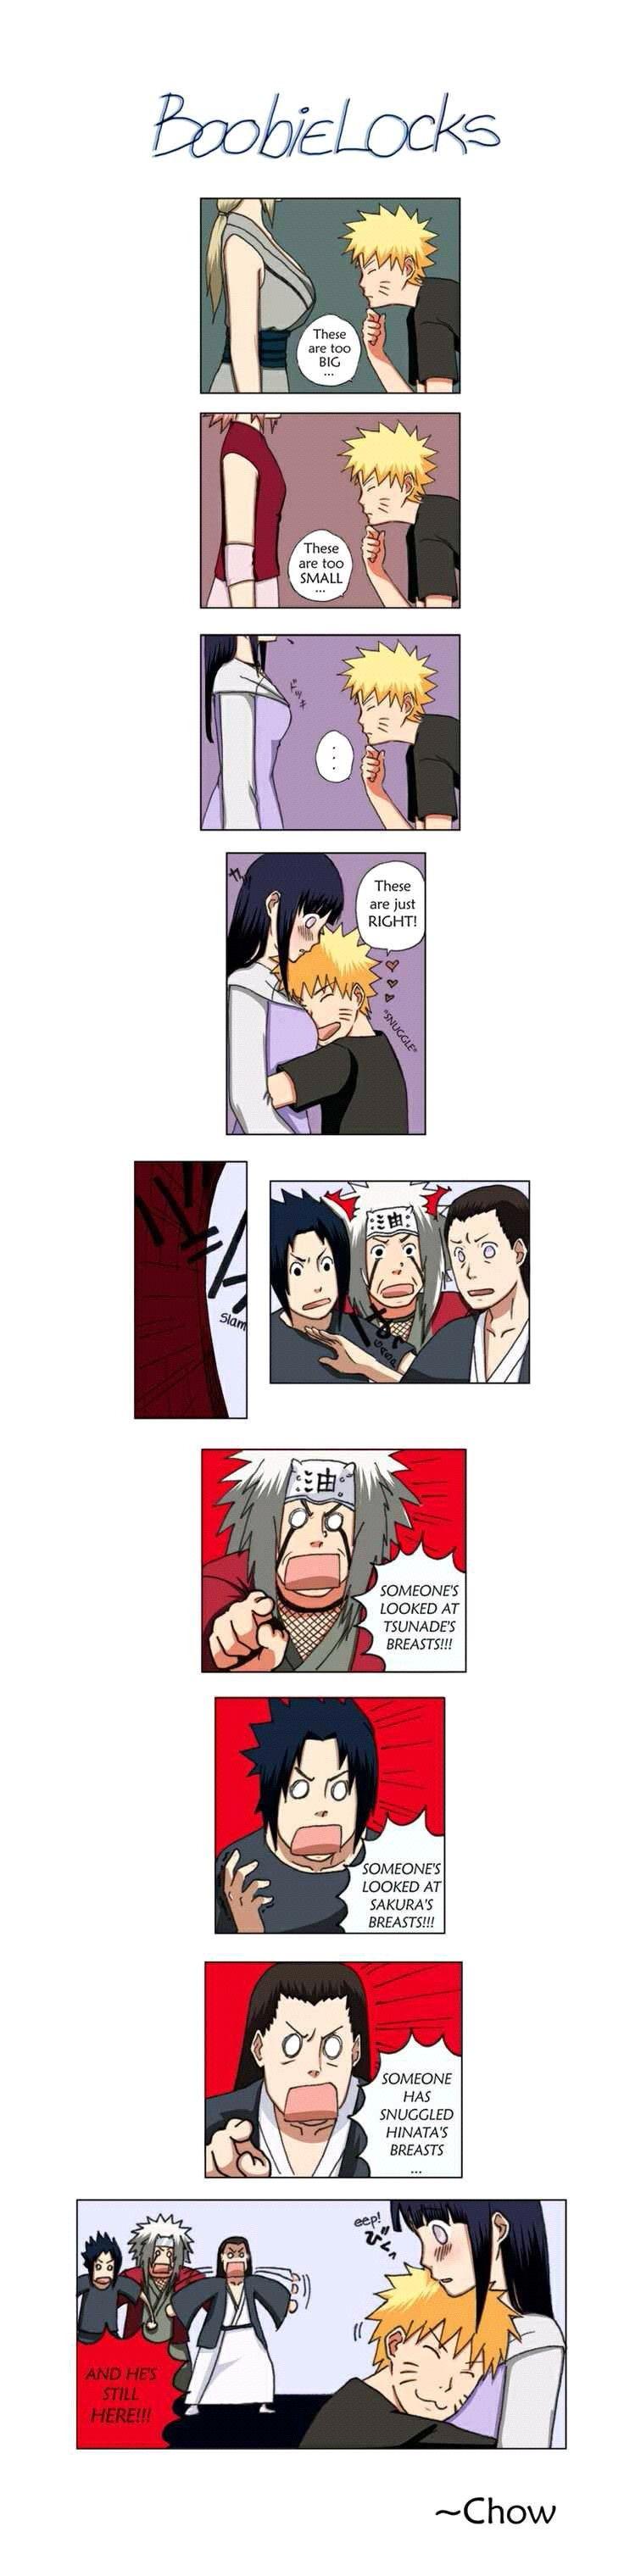 Haha Naruto's Boob Selection :)) XDDDD